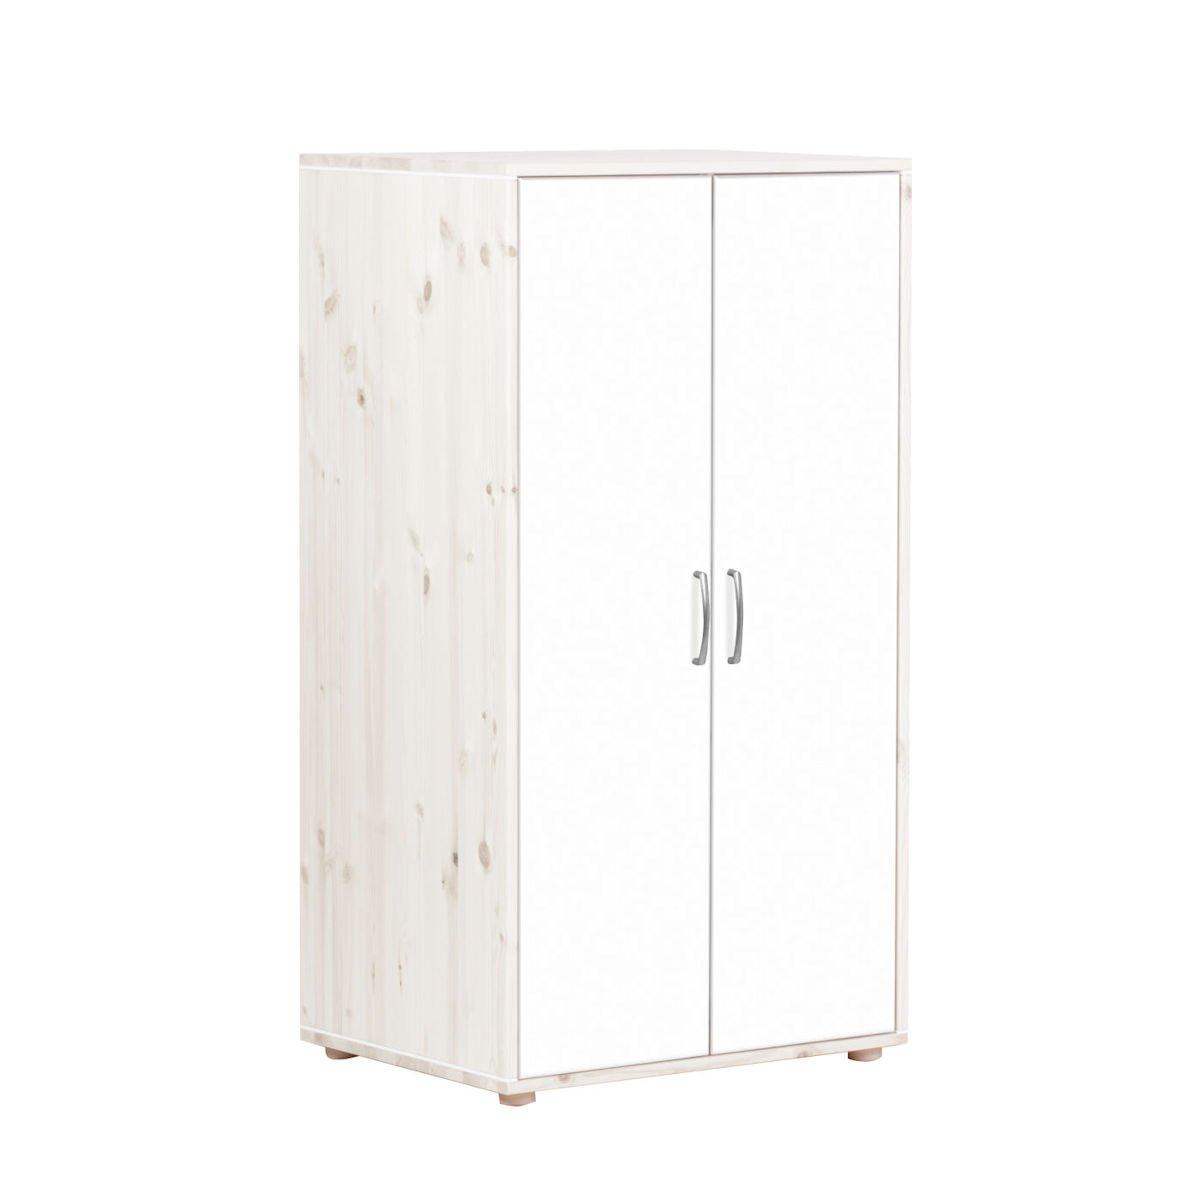 kleiderschrank 2 t ren kieferwei lack wei wei 358. Black Bedroom Furniture Sets. Home Design Ideas